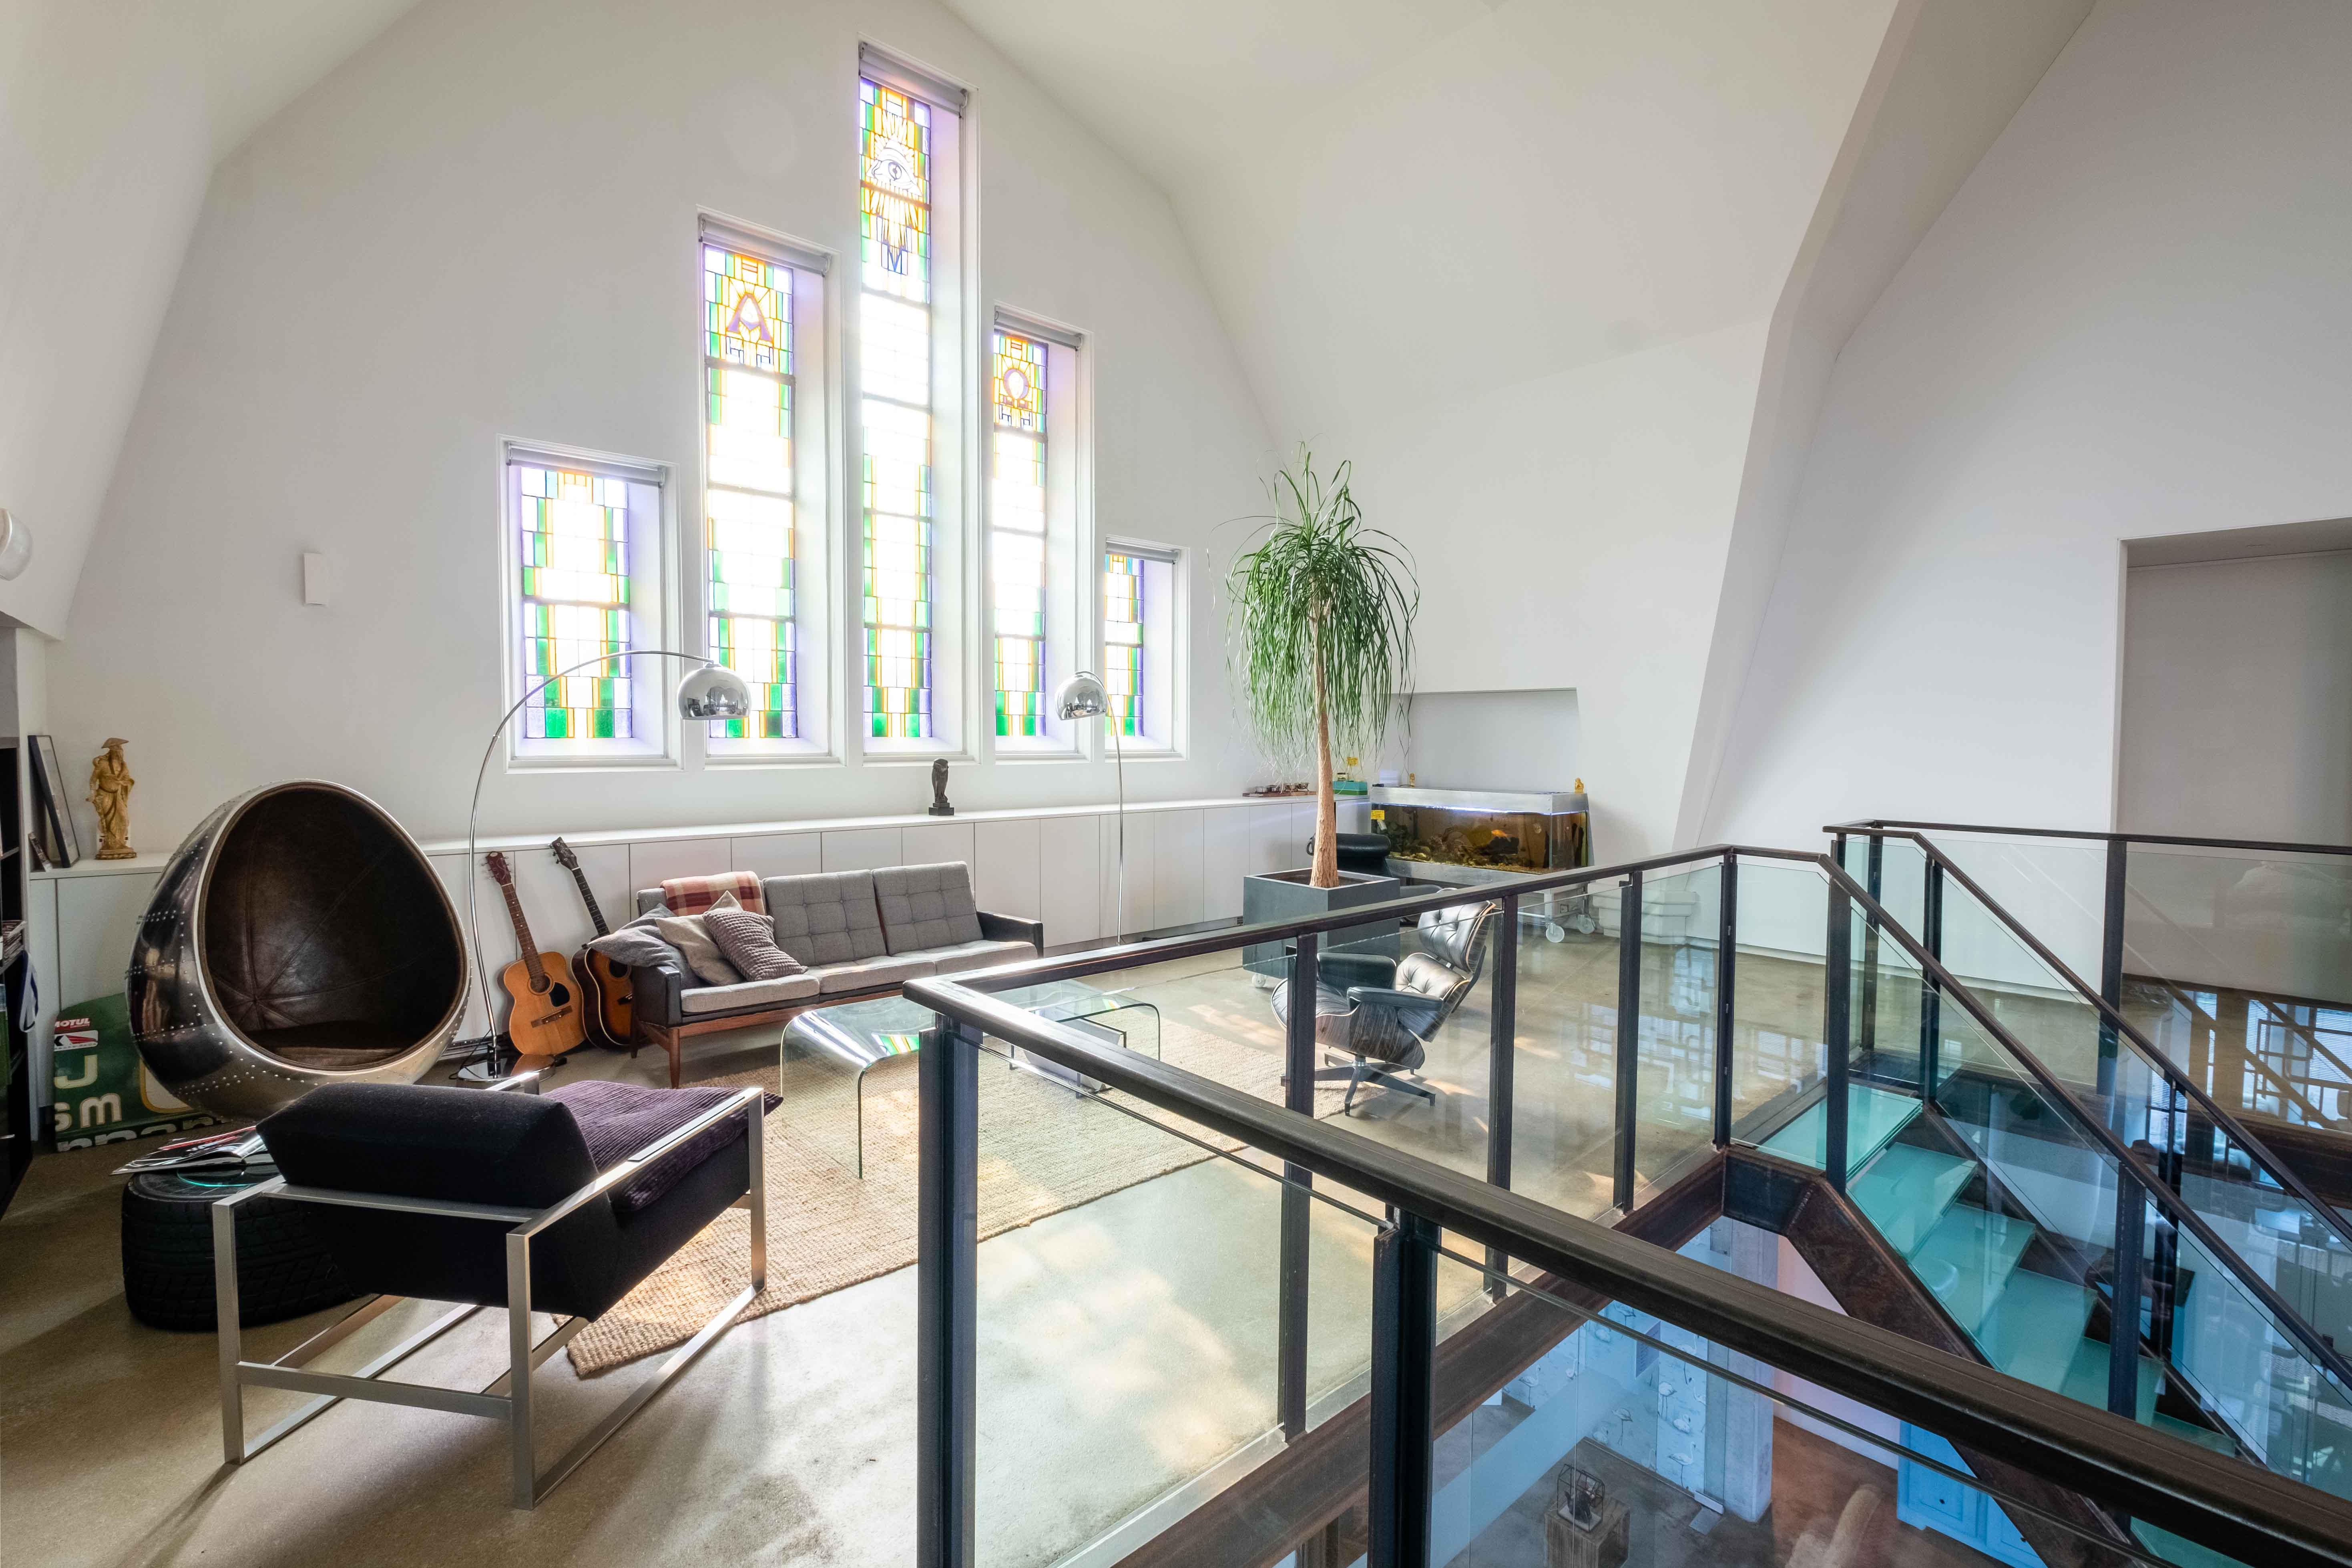 Interieur fotograaf in Oldenzaal